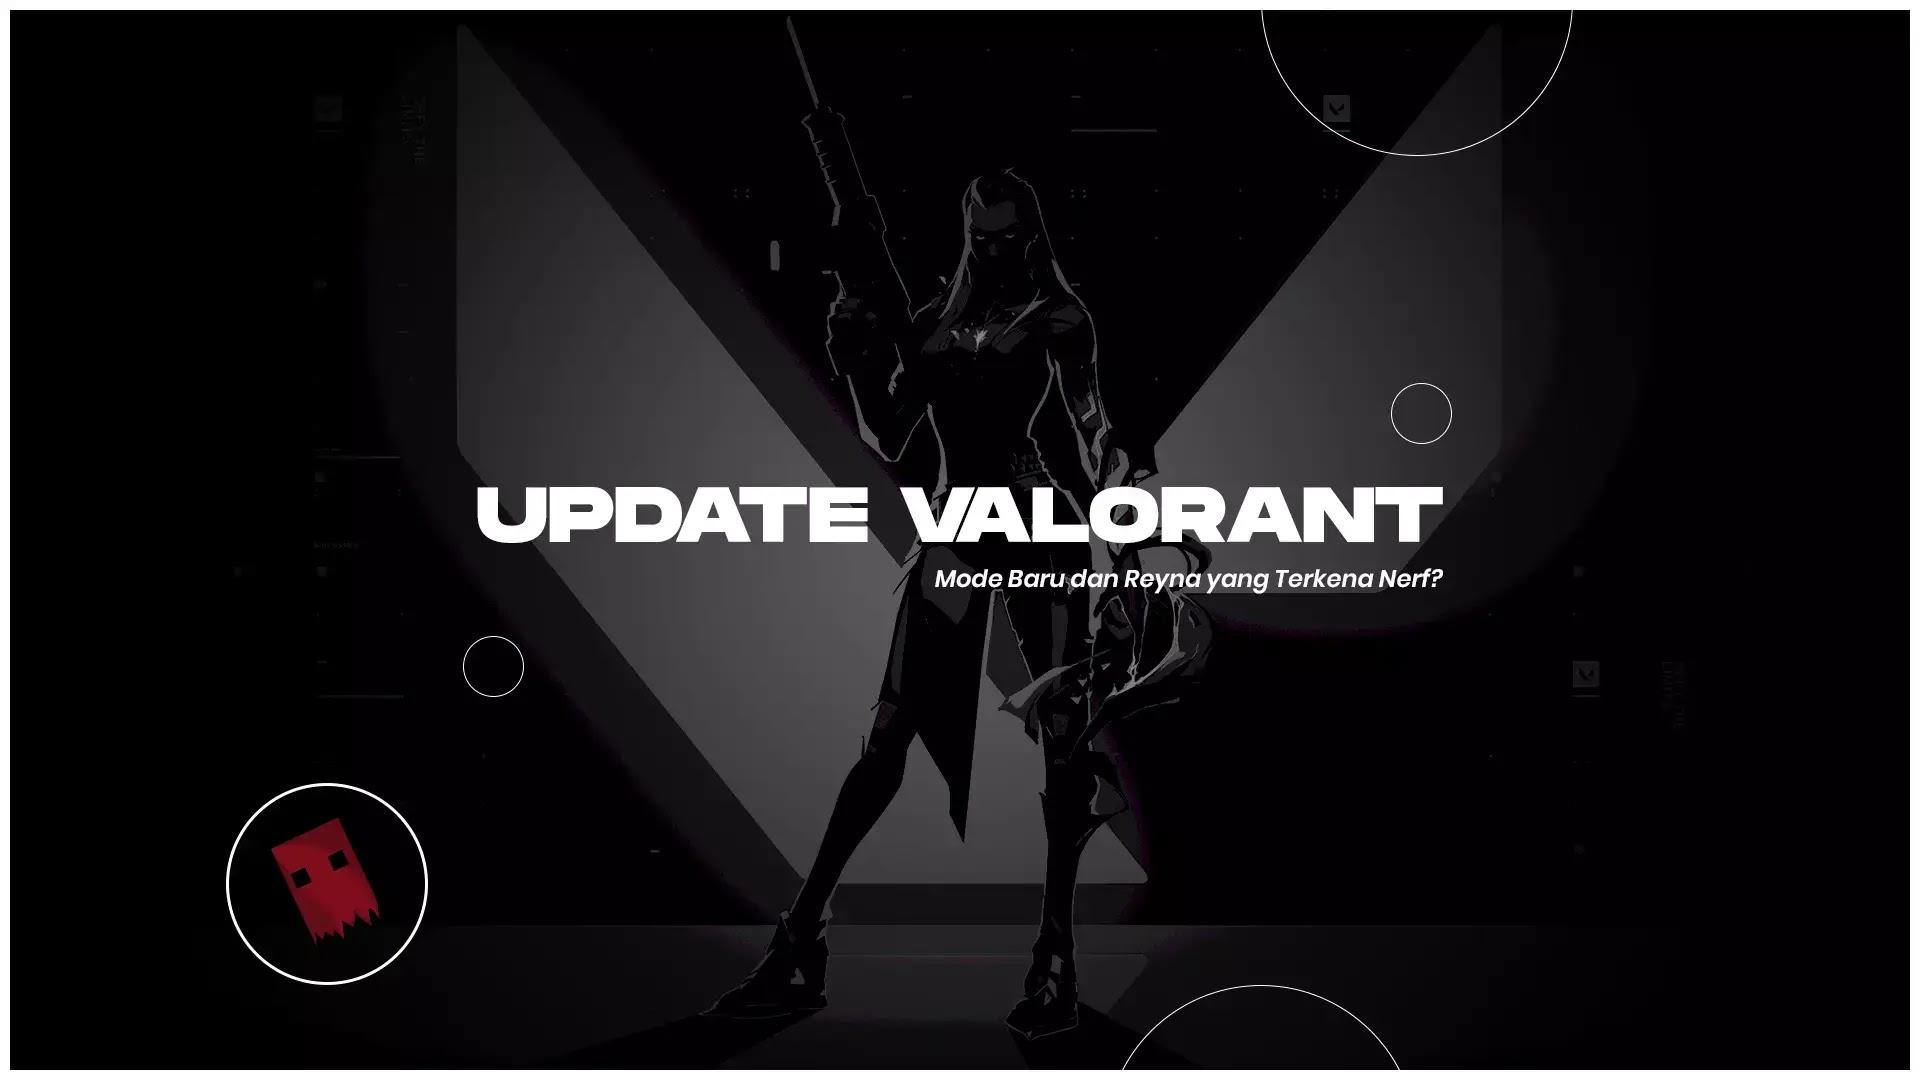 Update Valorant Mode Baru dan Reyna yang Terkena Nerf?